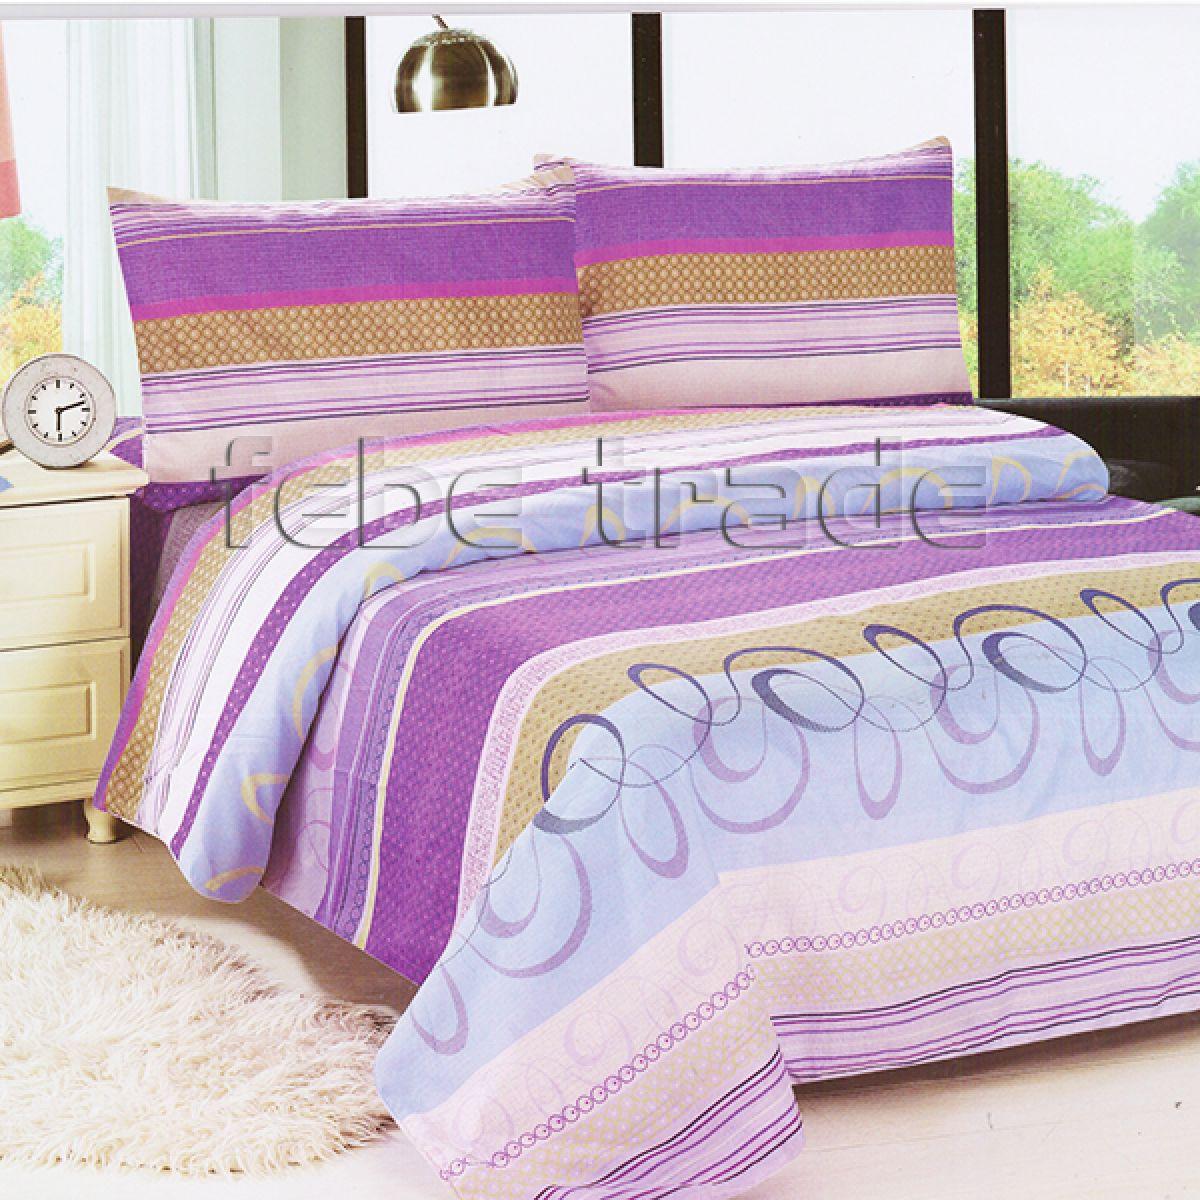 Cheap Beddings - TPR-YP-478 - 180x200 cm - 4 pcs